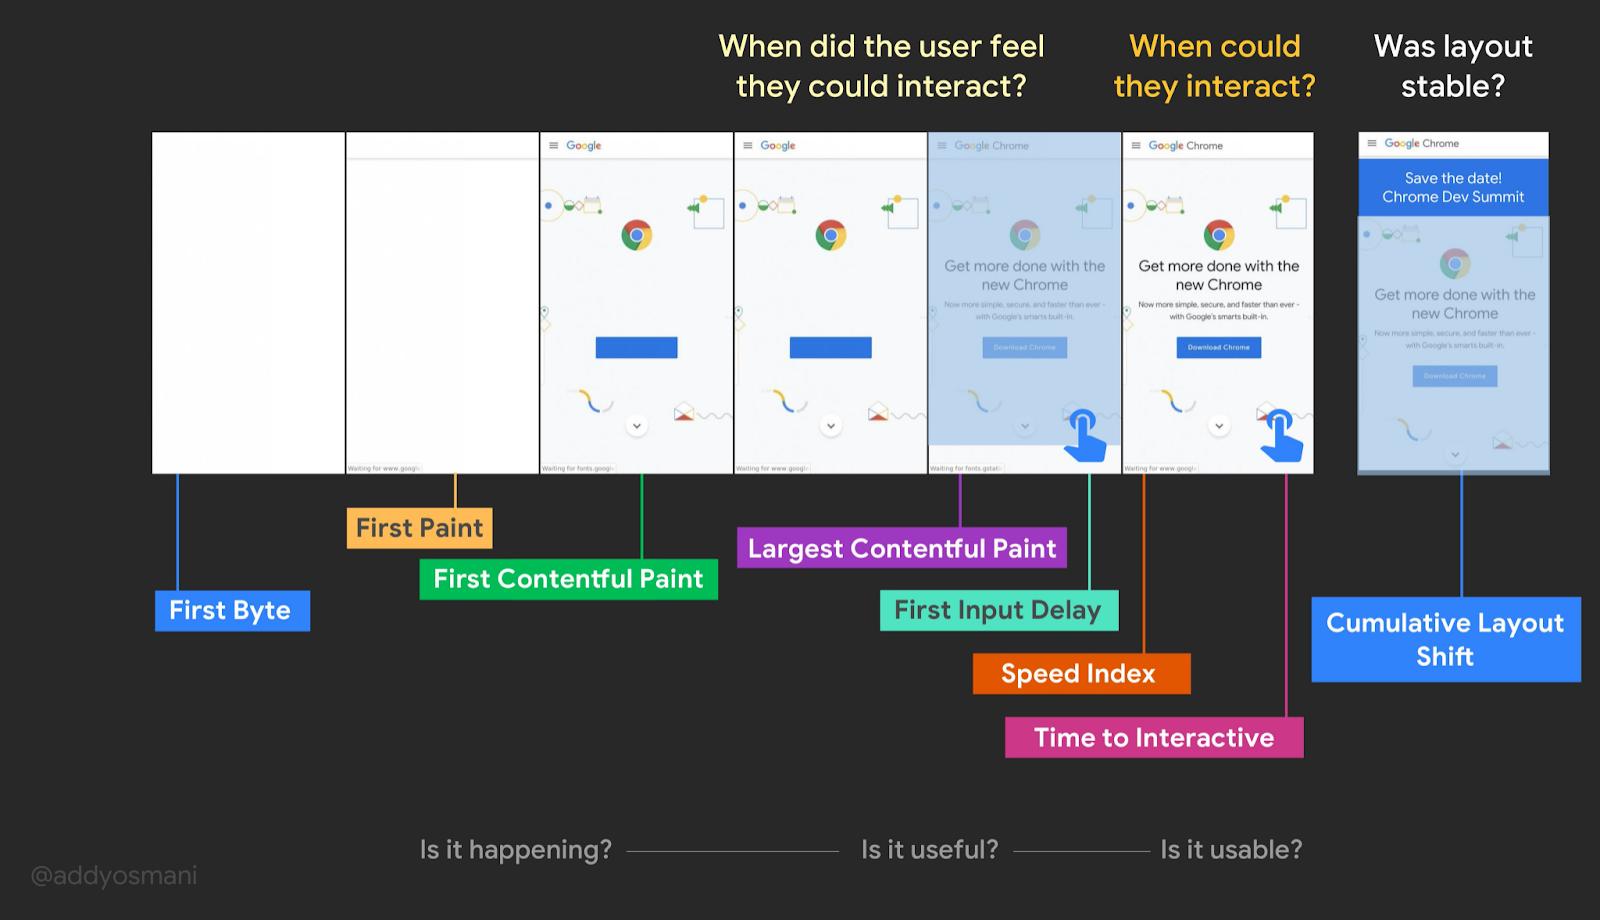 Addy Osmani's visualization of Web Vitals